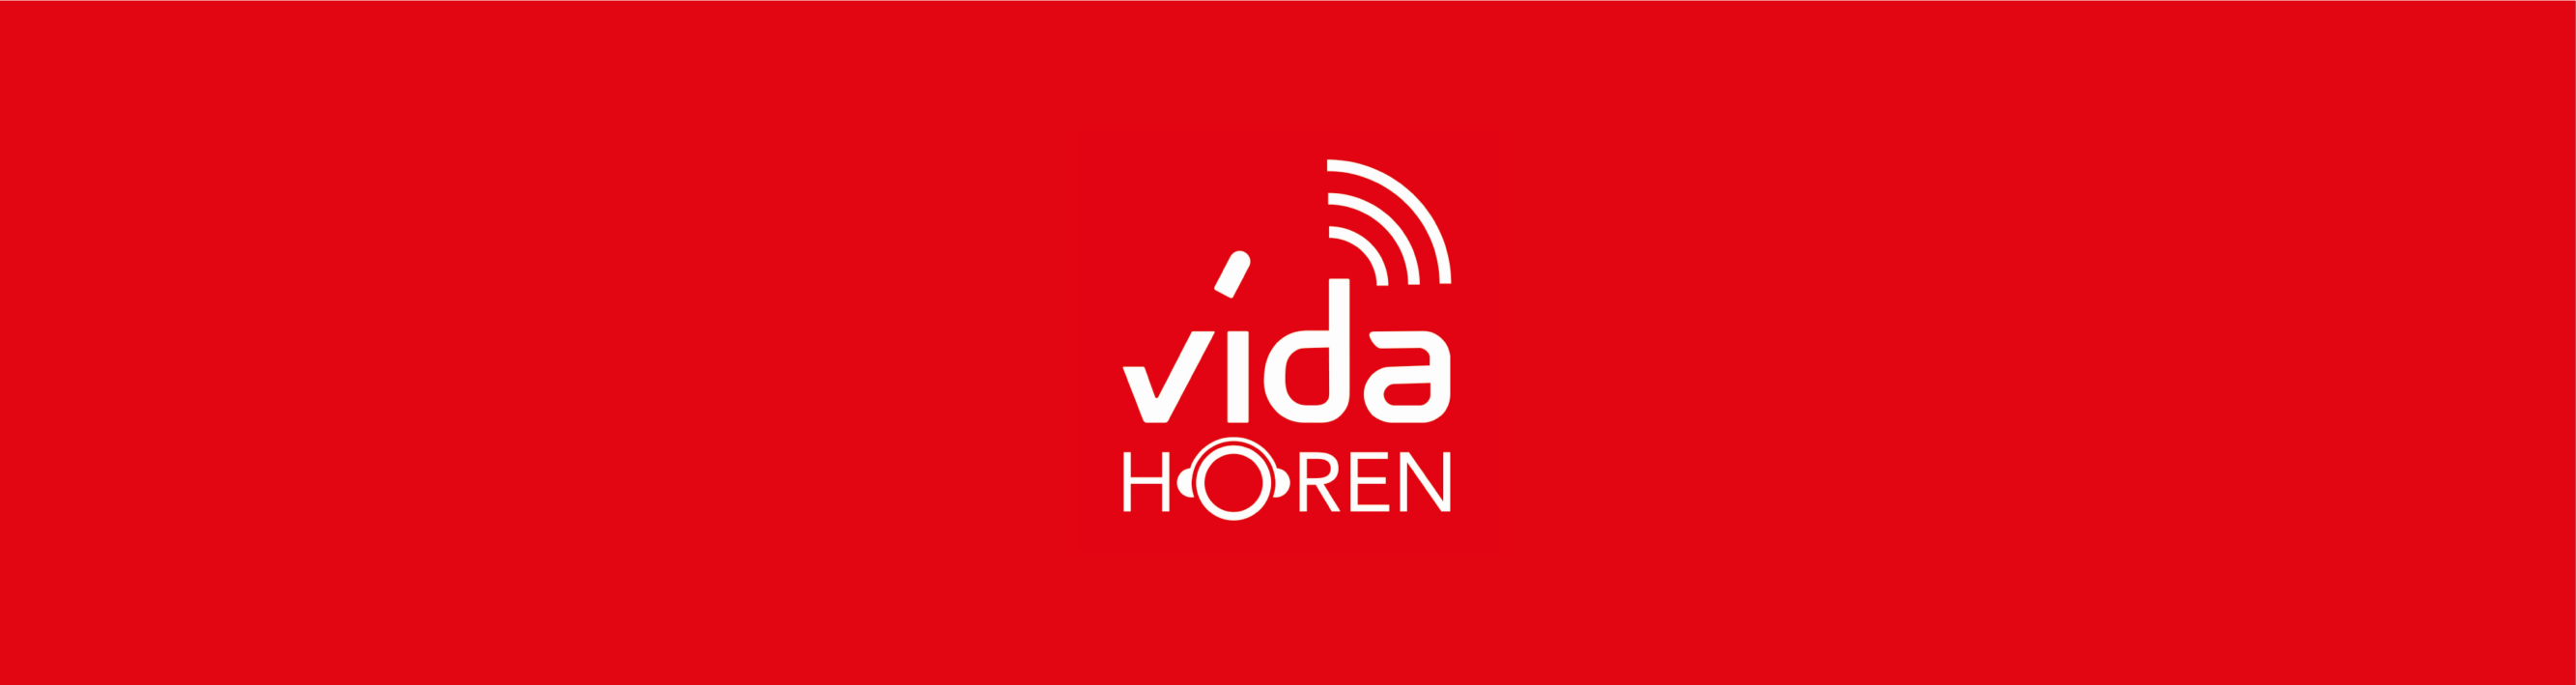 Podcast Banner - vidaHören